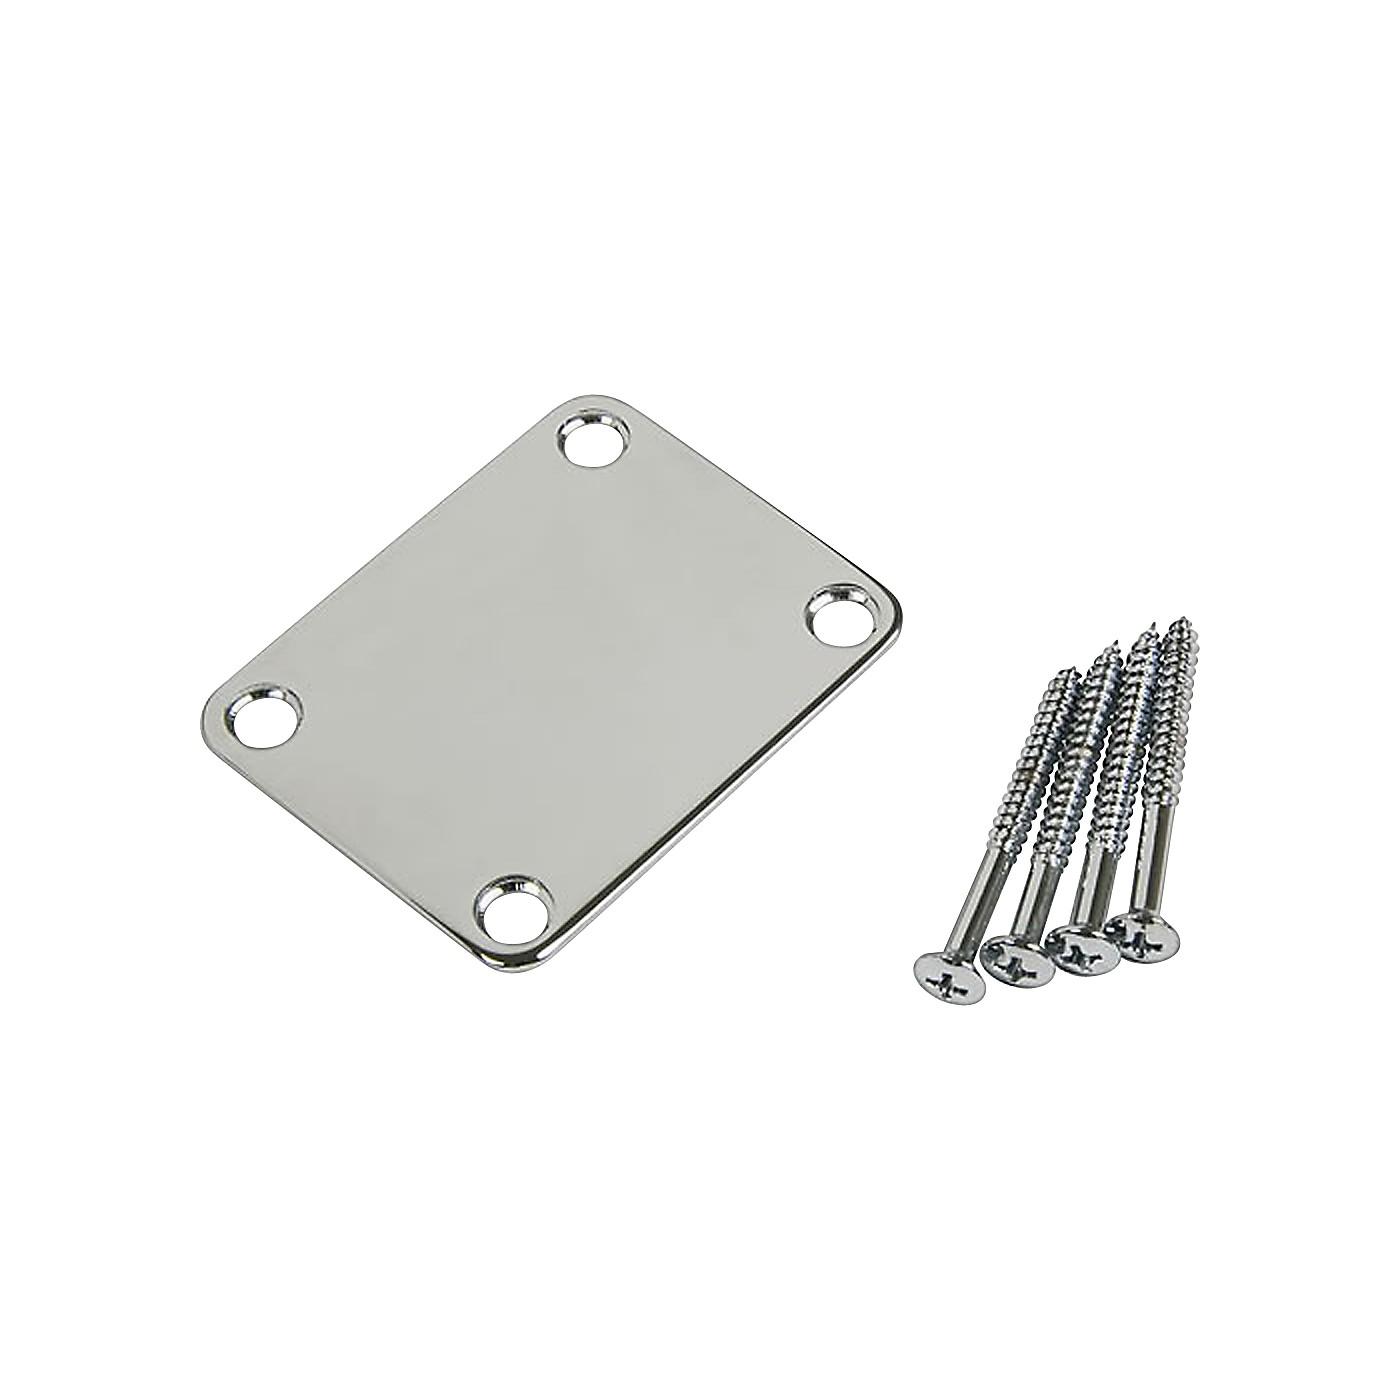 Proline 4-Screw Neck Plate thumbnail